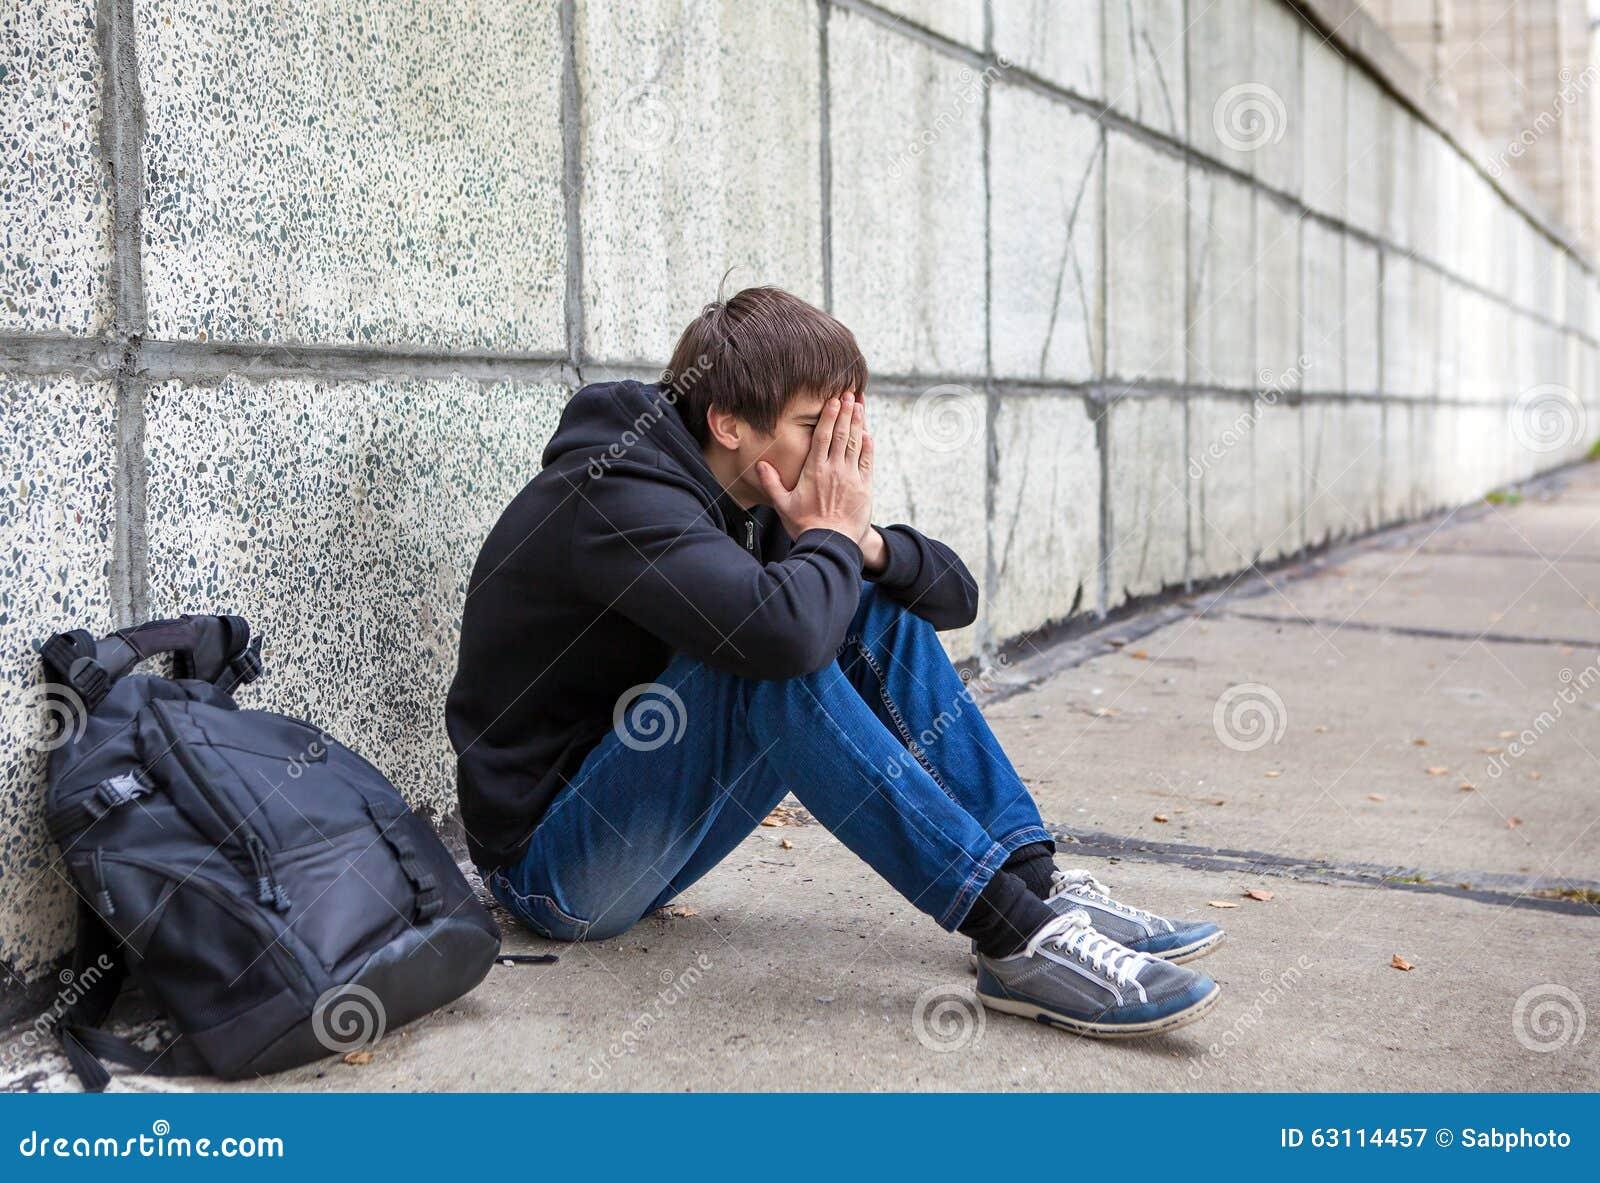 sad young man outdoor stock photo image 63114457. Black Bedroom Furniture Sets. Home Design Ideas